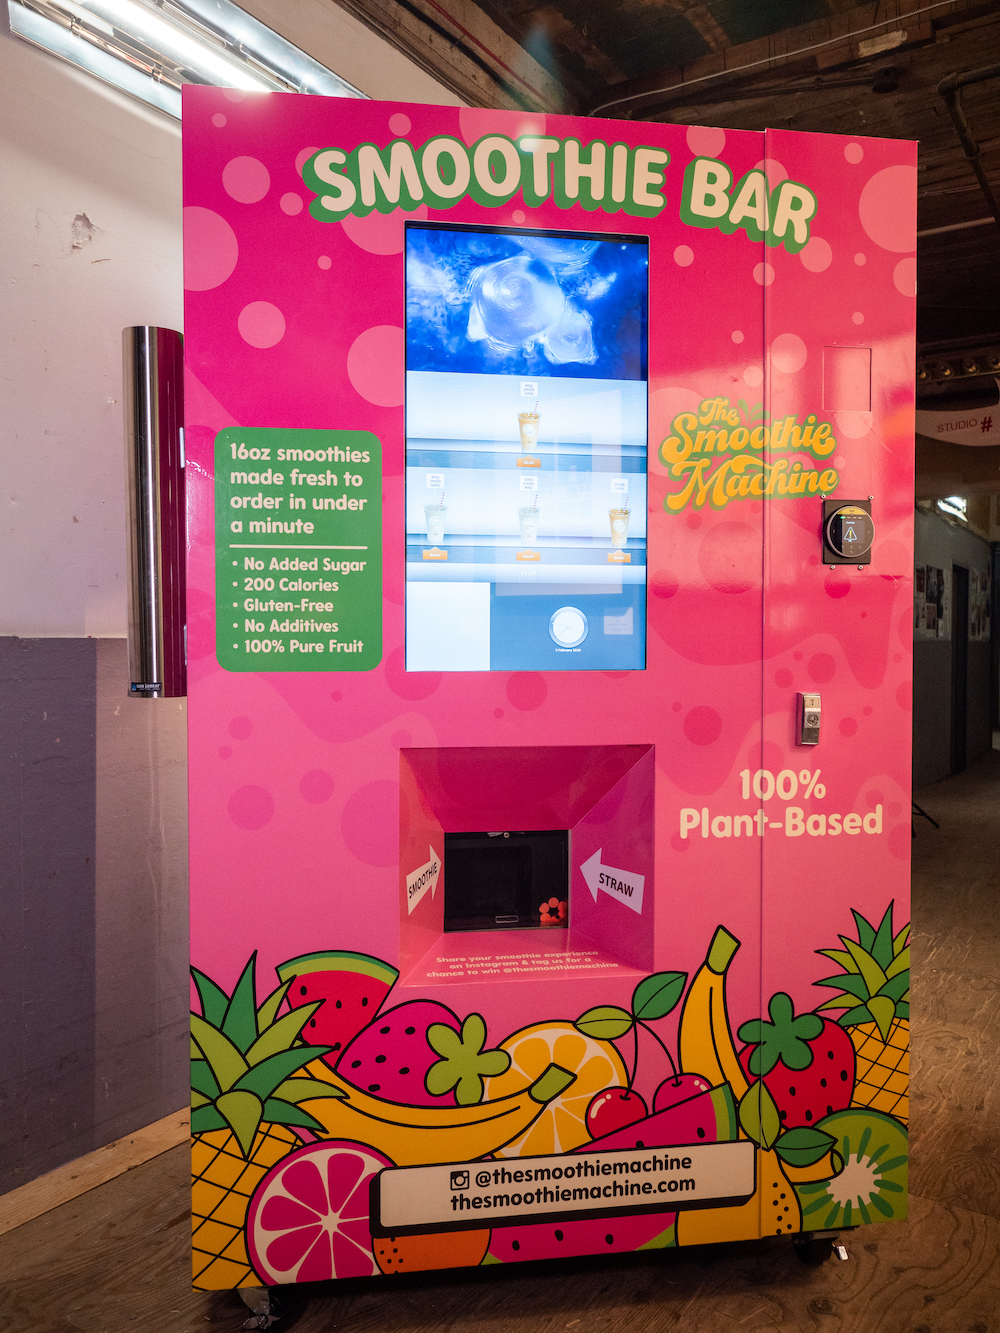 The Smoothie Machine